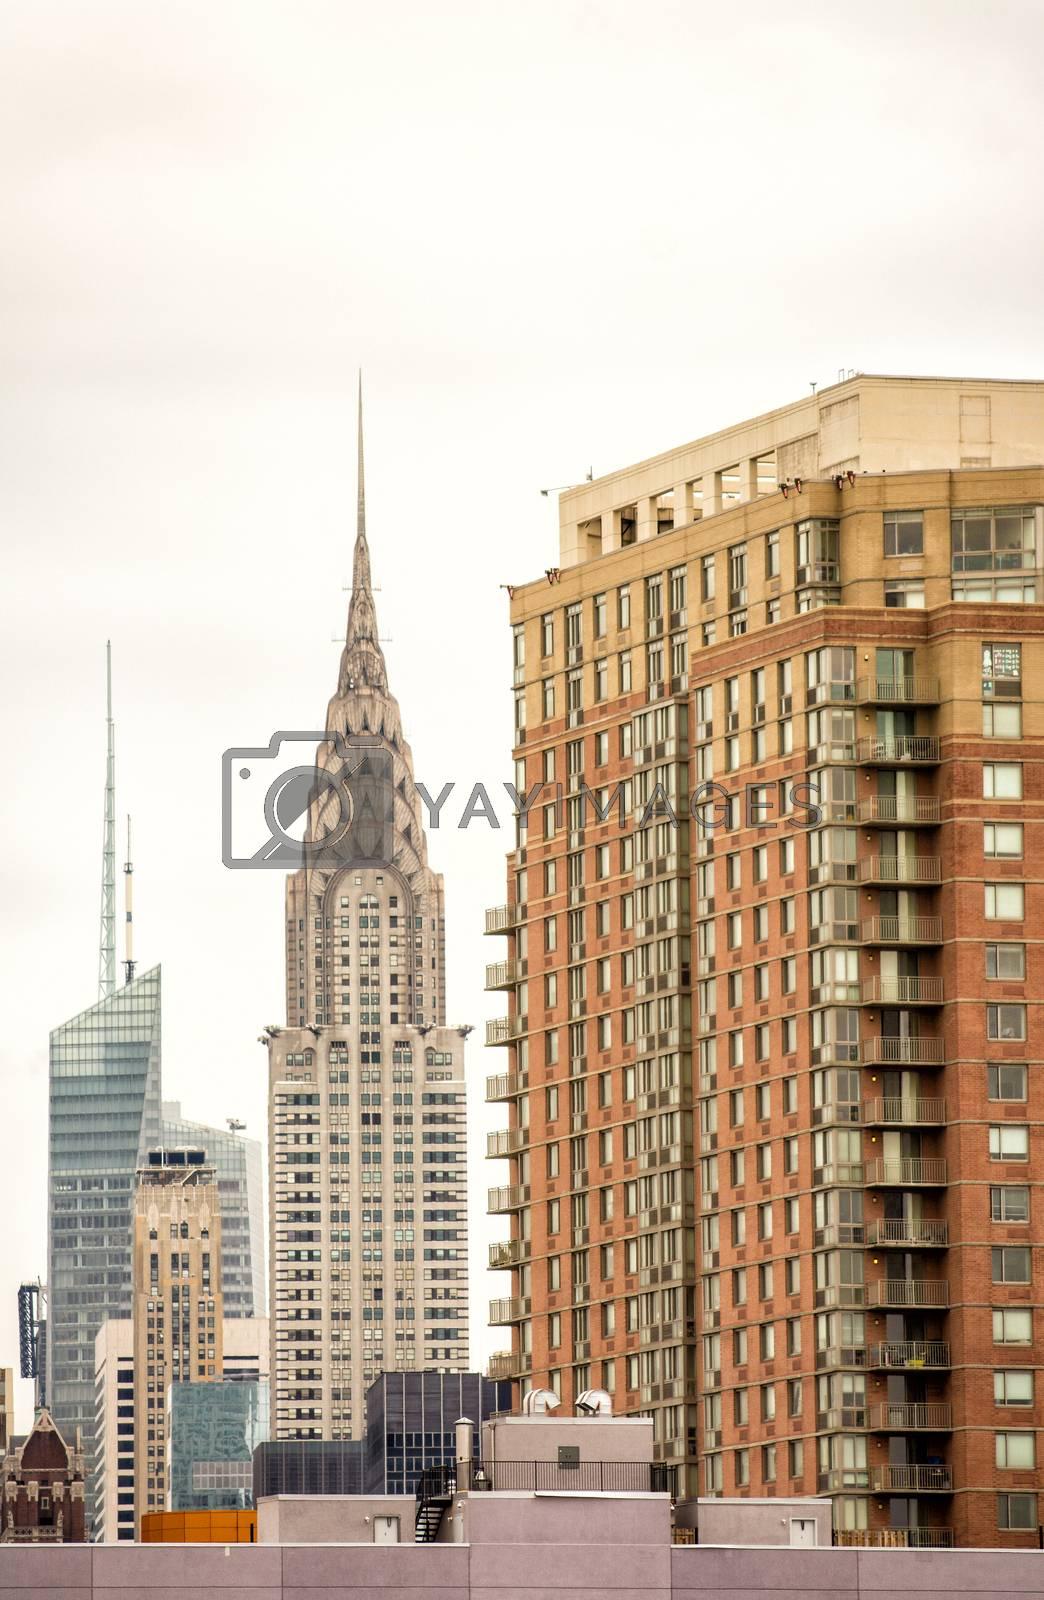 Buildings and skyscrapers of Manhattan.